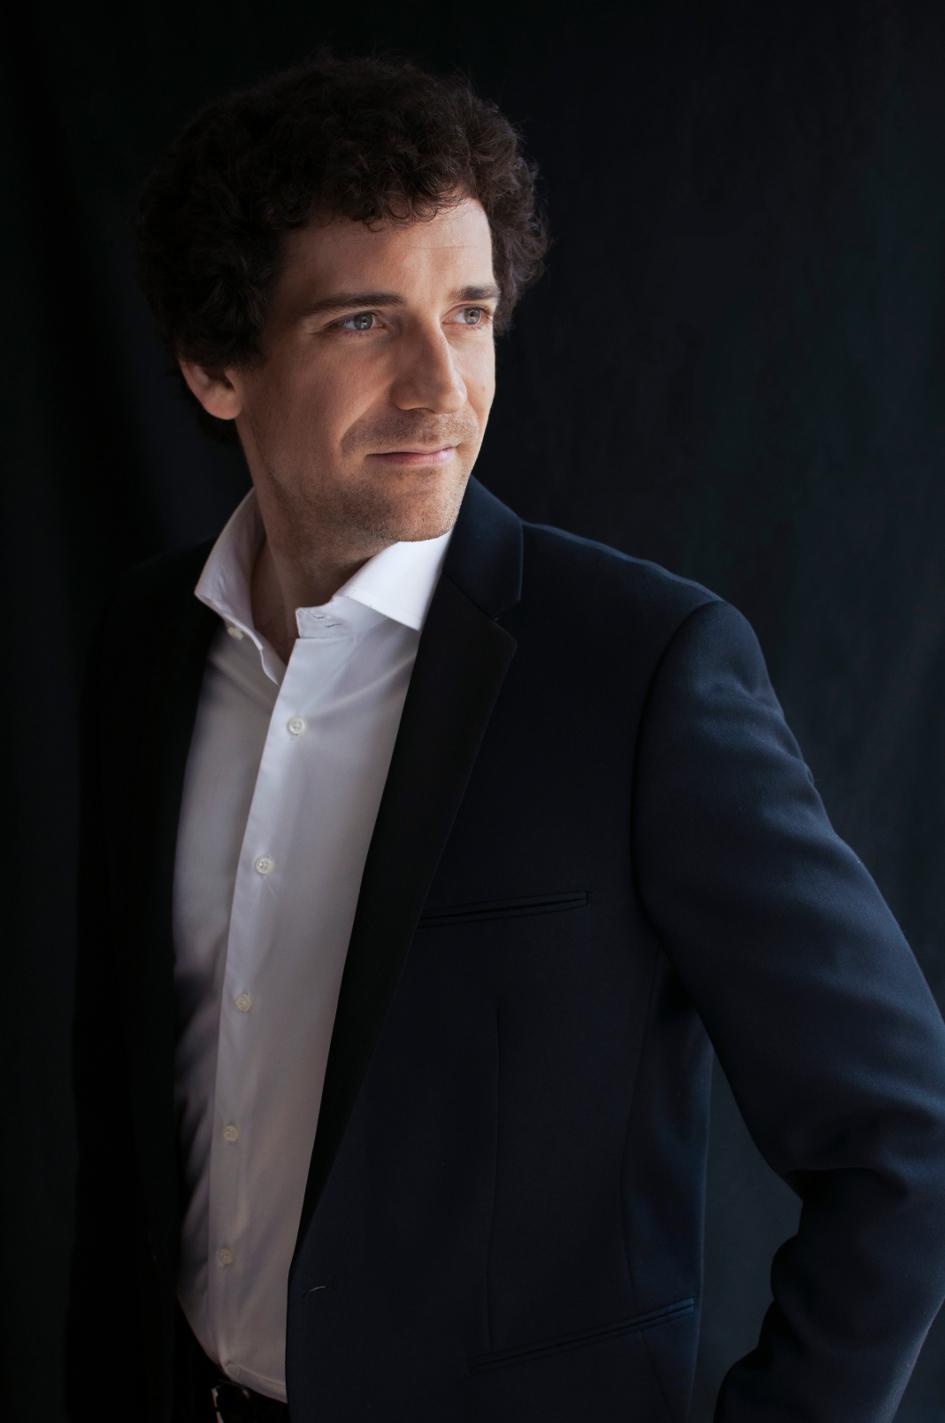 Nicolas Baldeyrou, Photo by Silvain Pierre